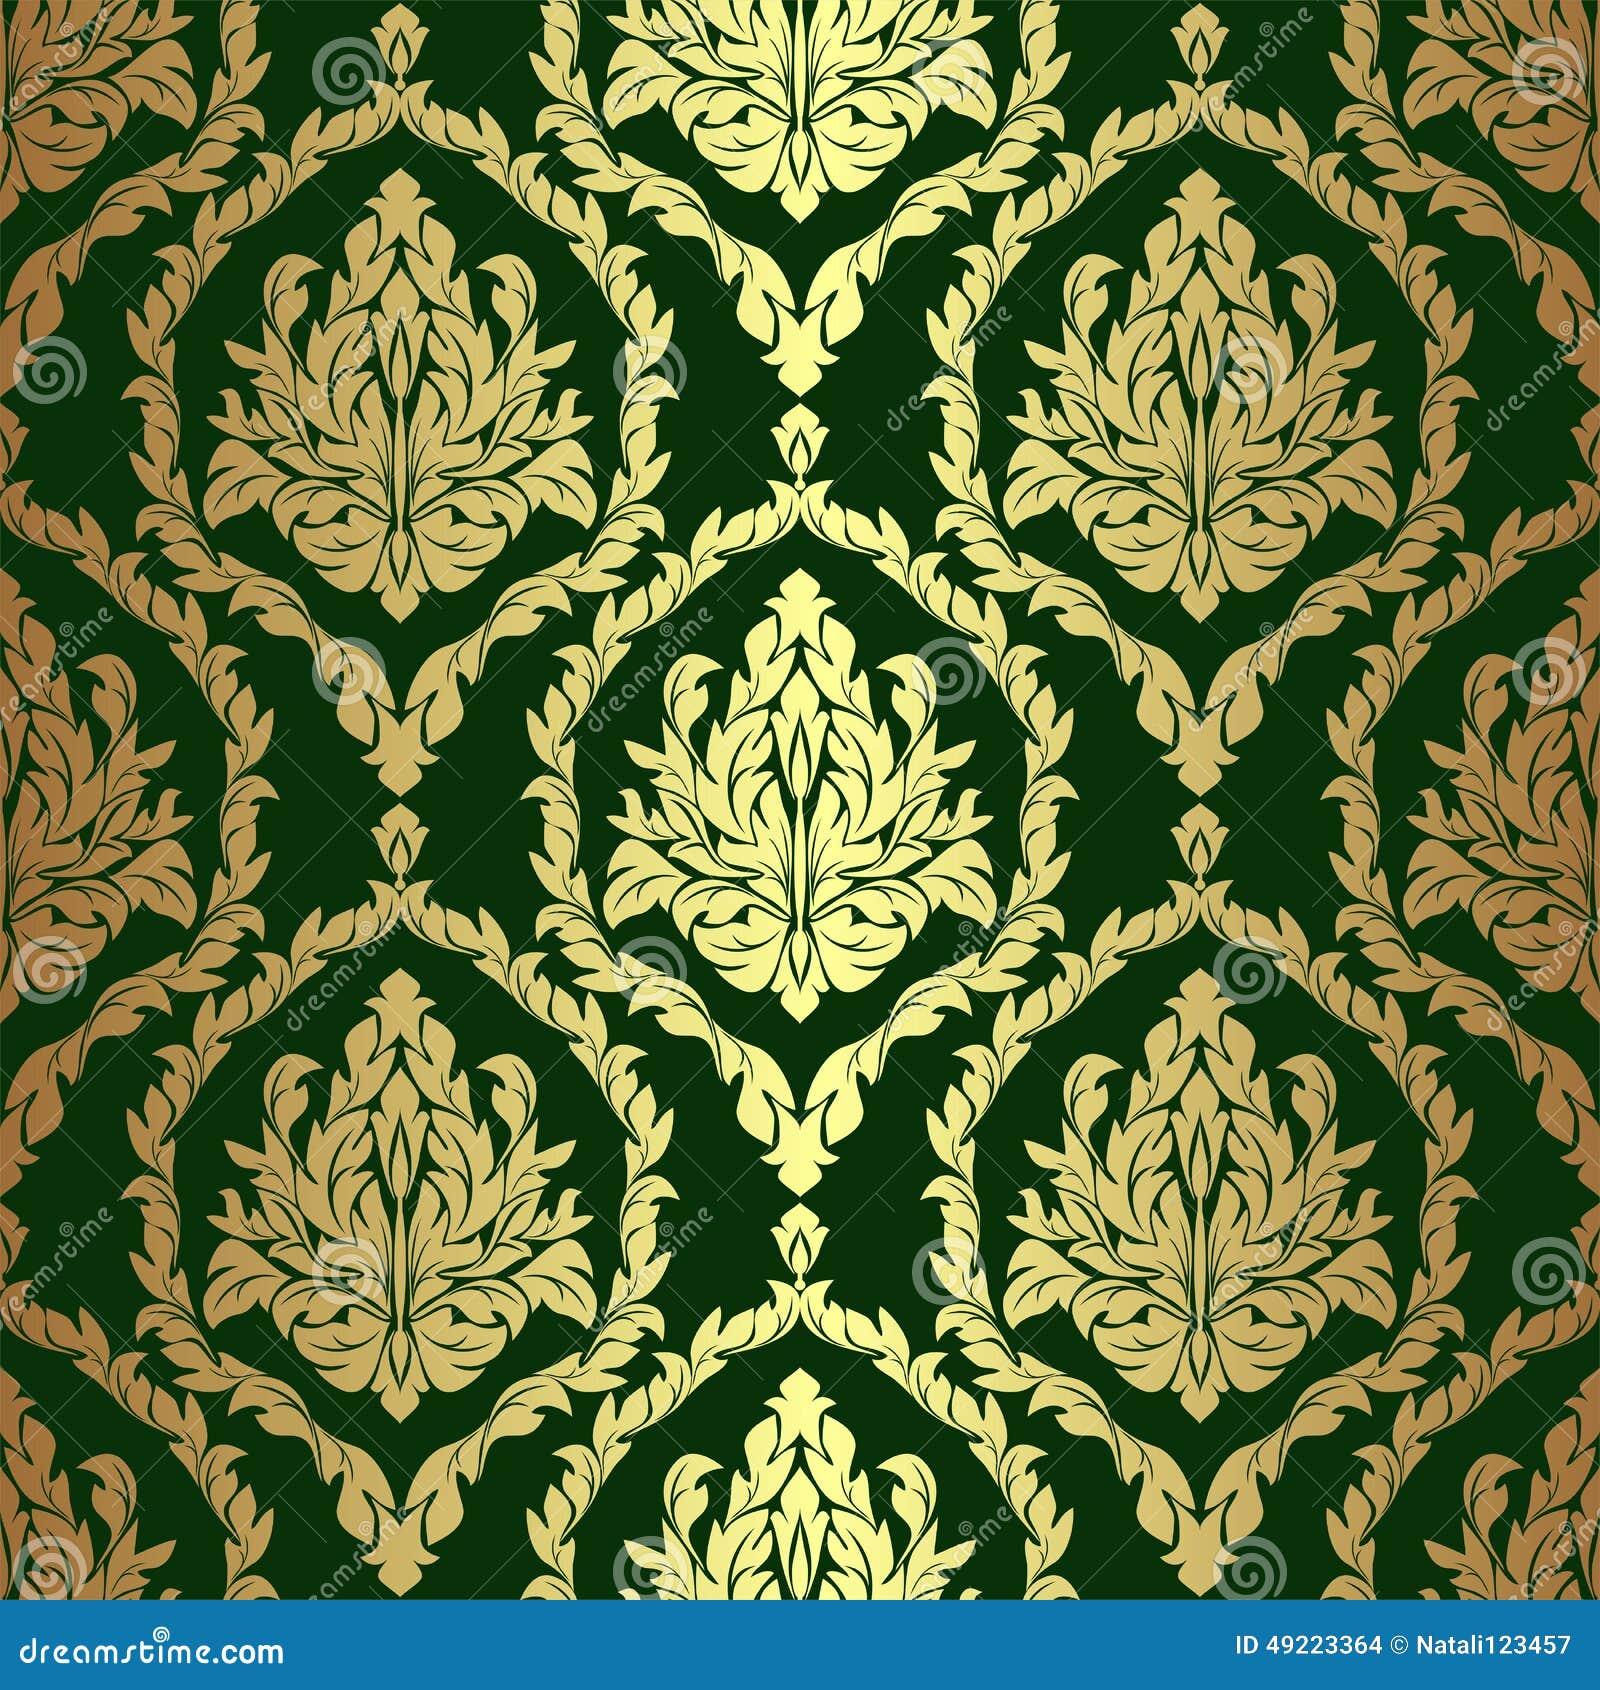 golden rich floral damask wallpaper on green stock vector